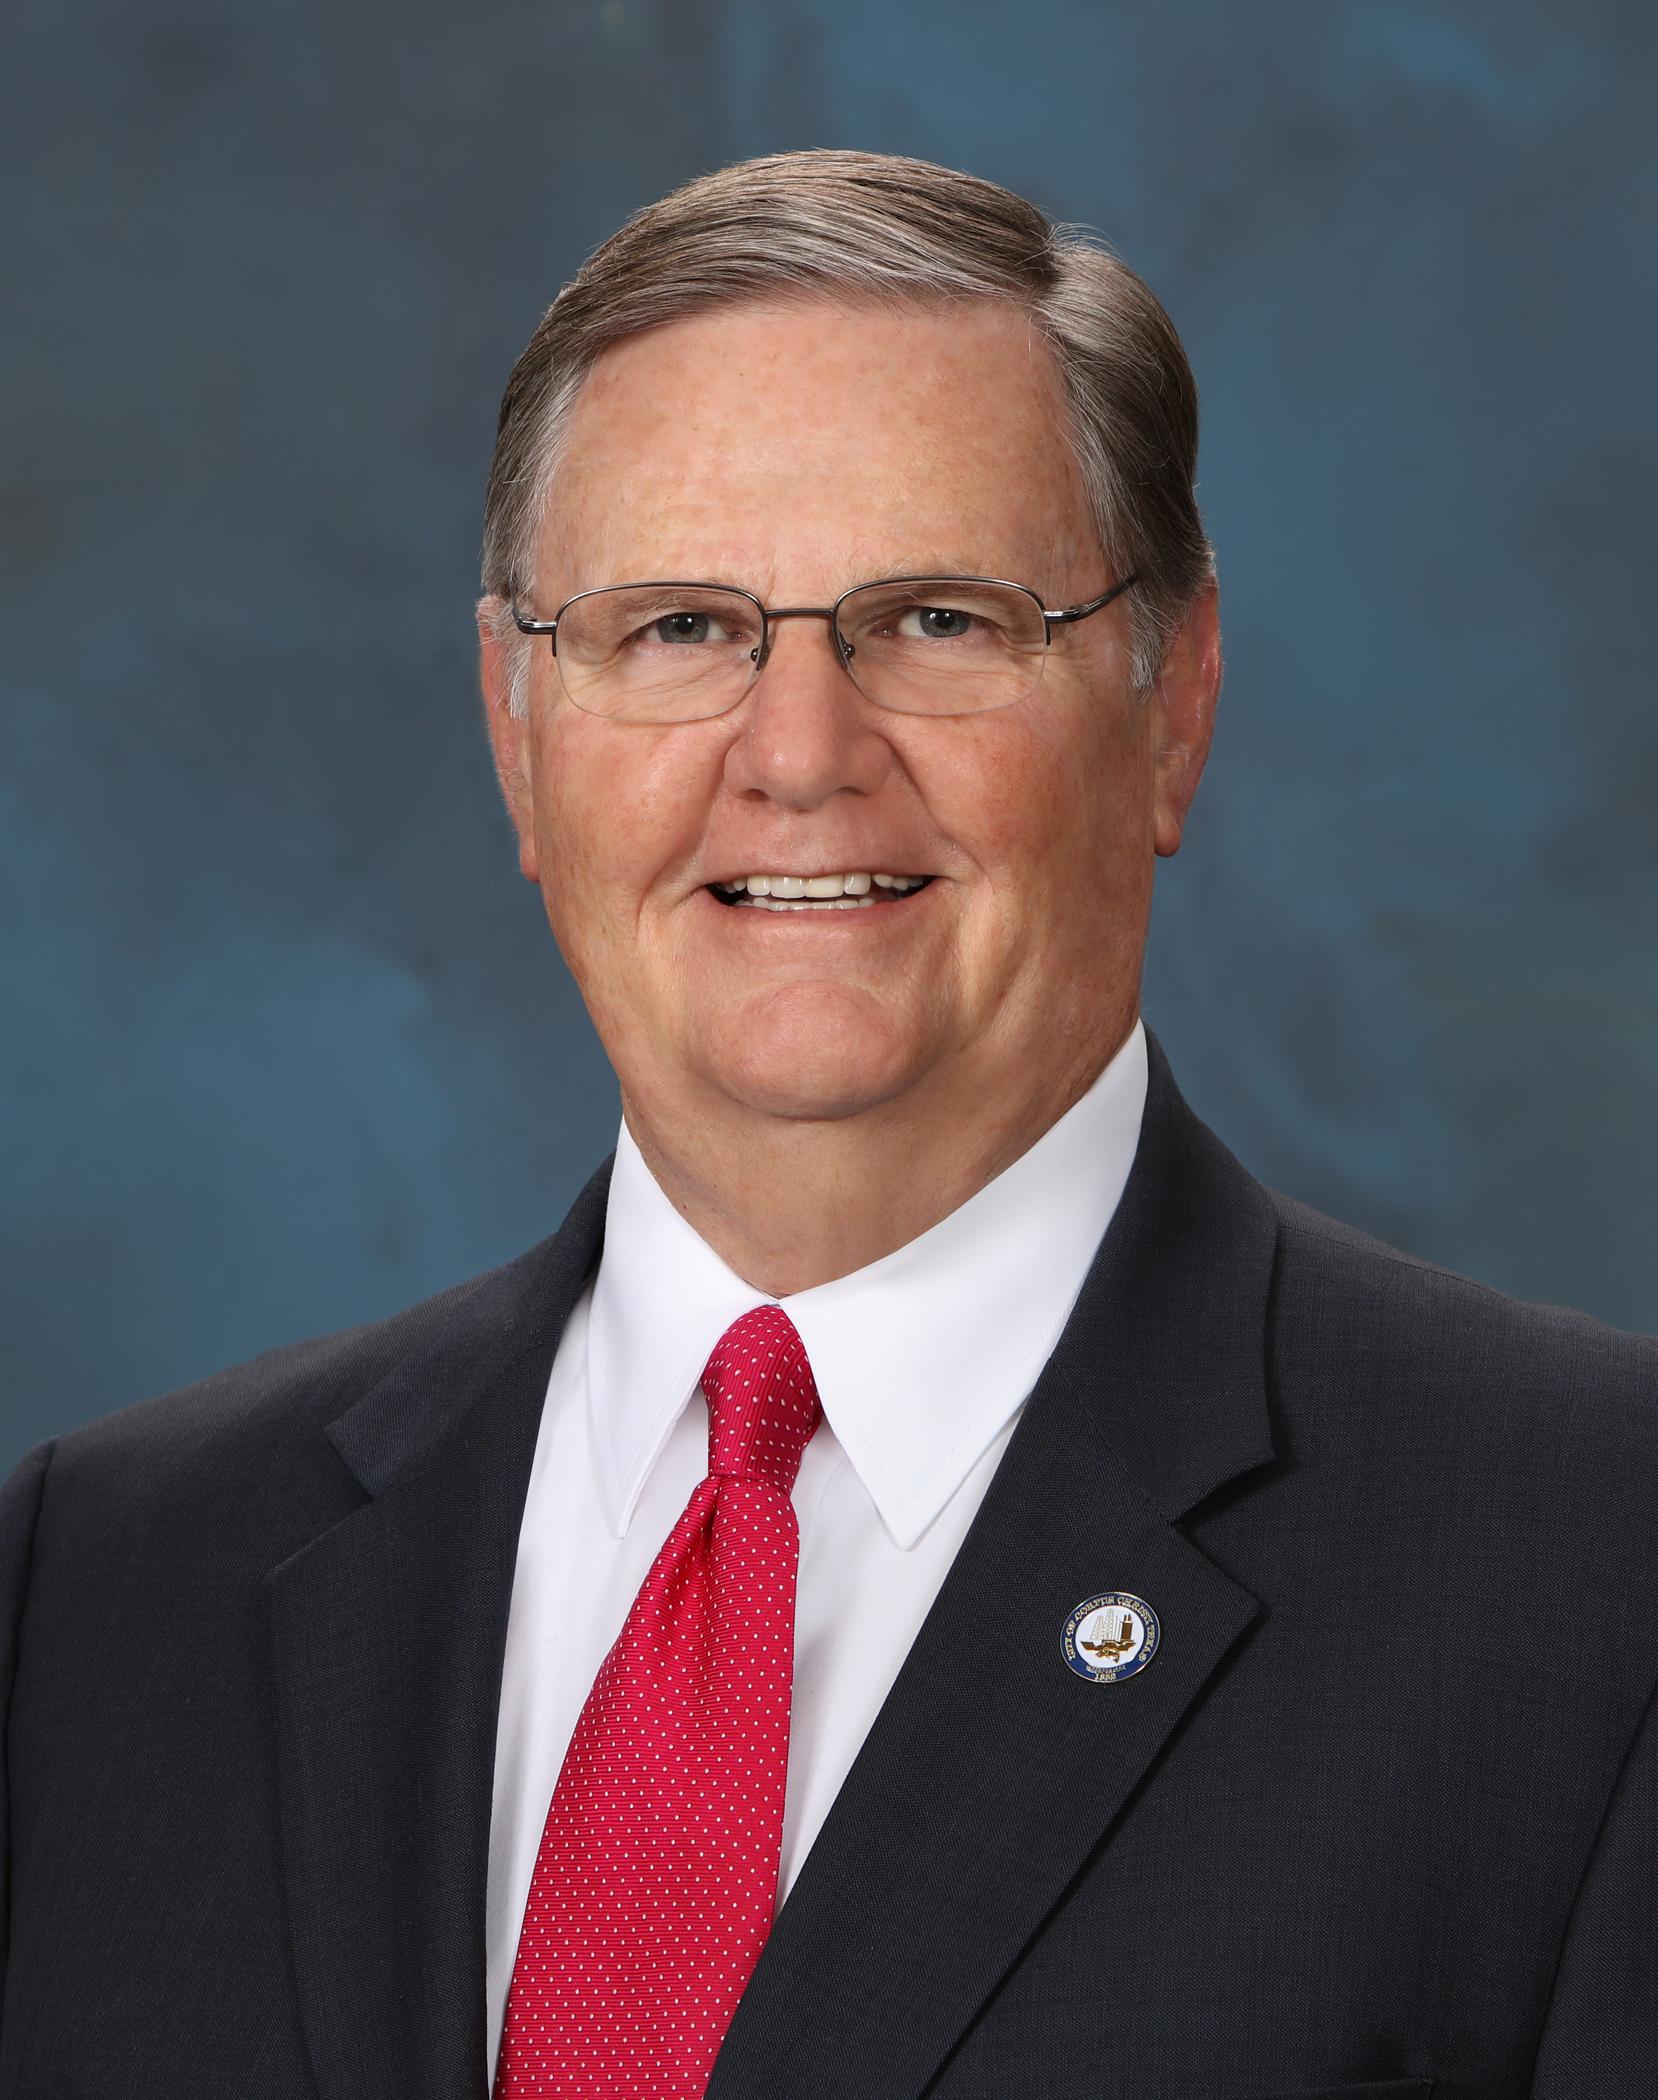 Mayor Joe McComb